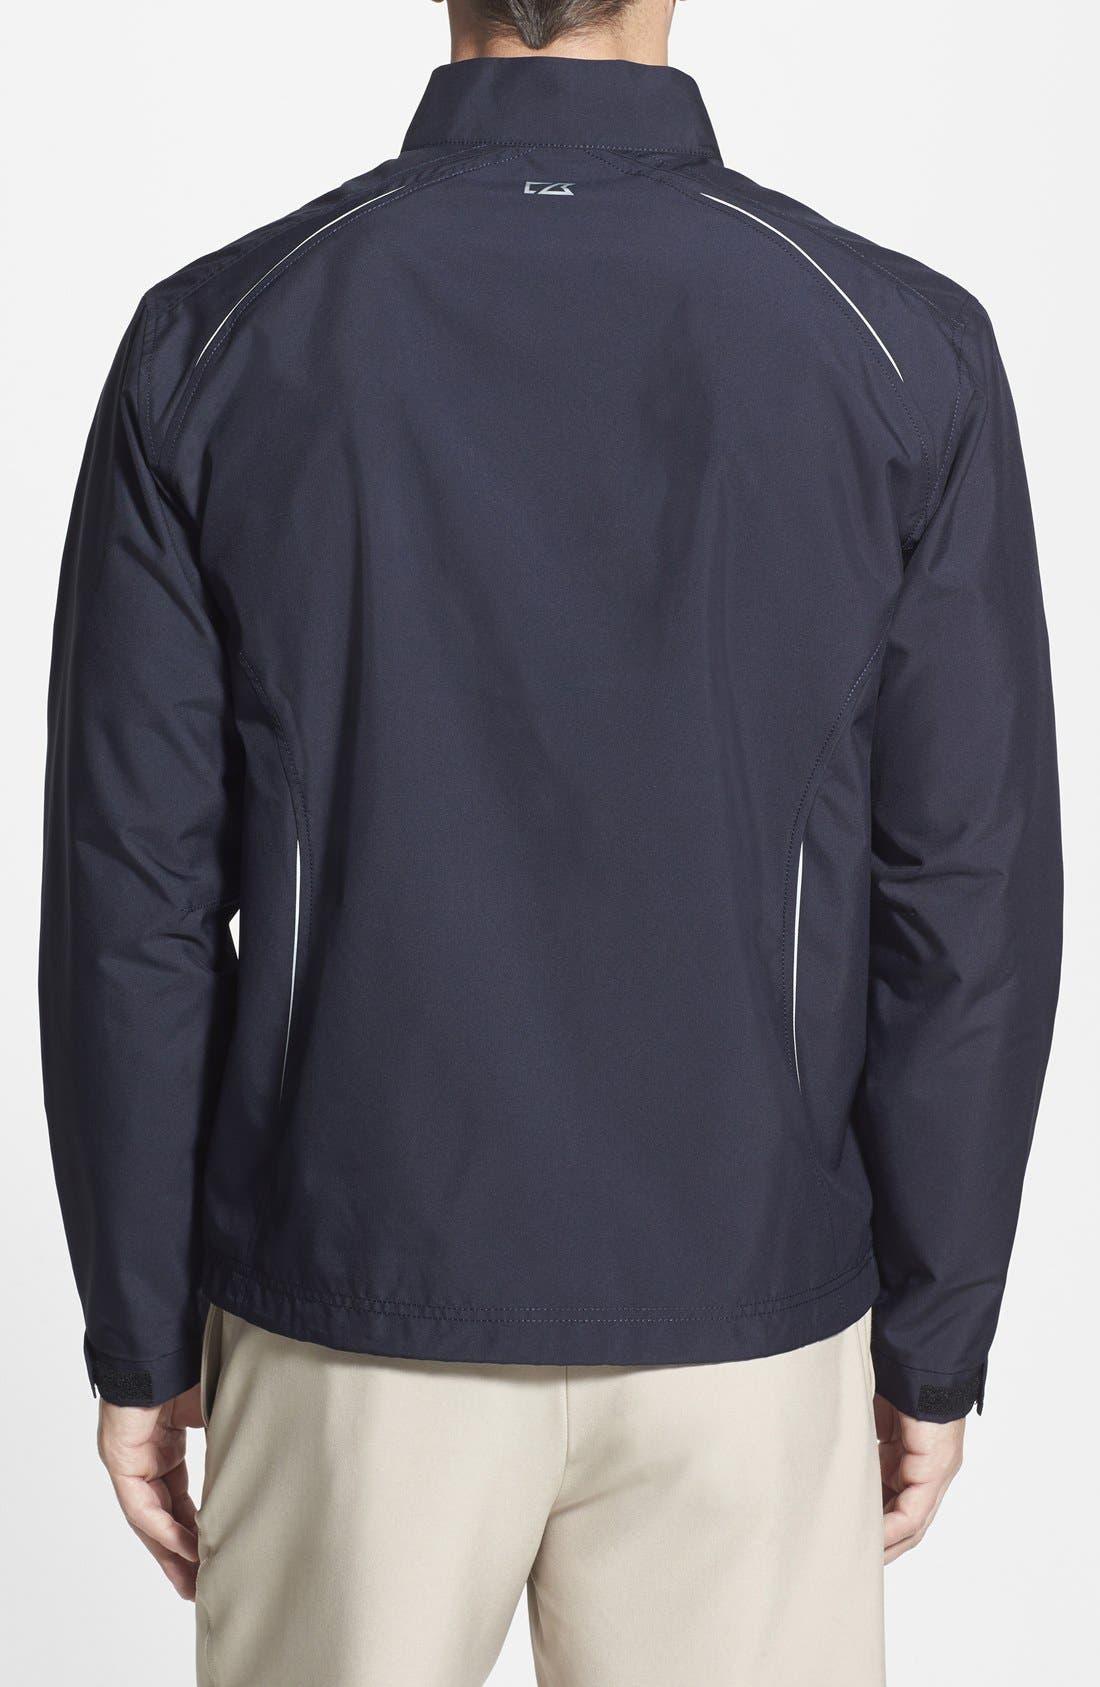 New England Patriots - Beacon WeatherTec Wind & Water Resistant Jacket,                             Alternate thumbnail 3, color,                             420